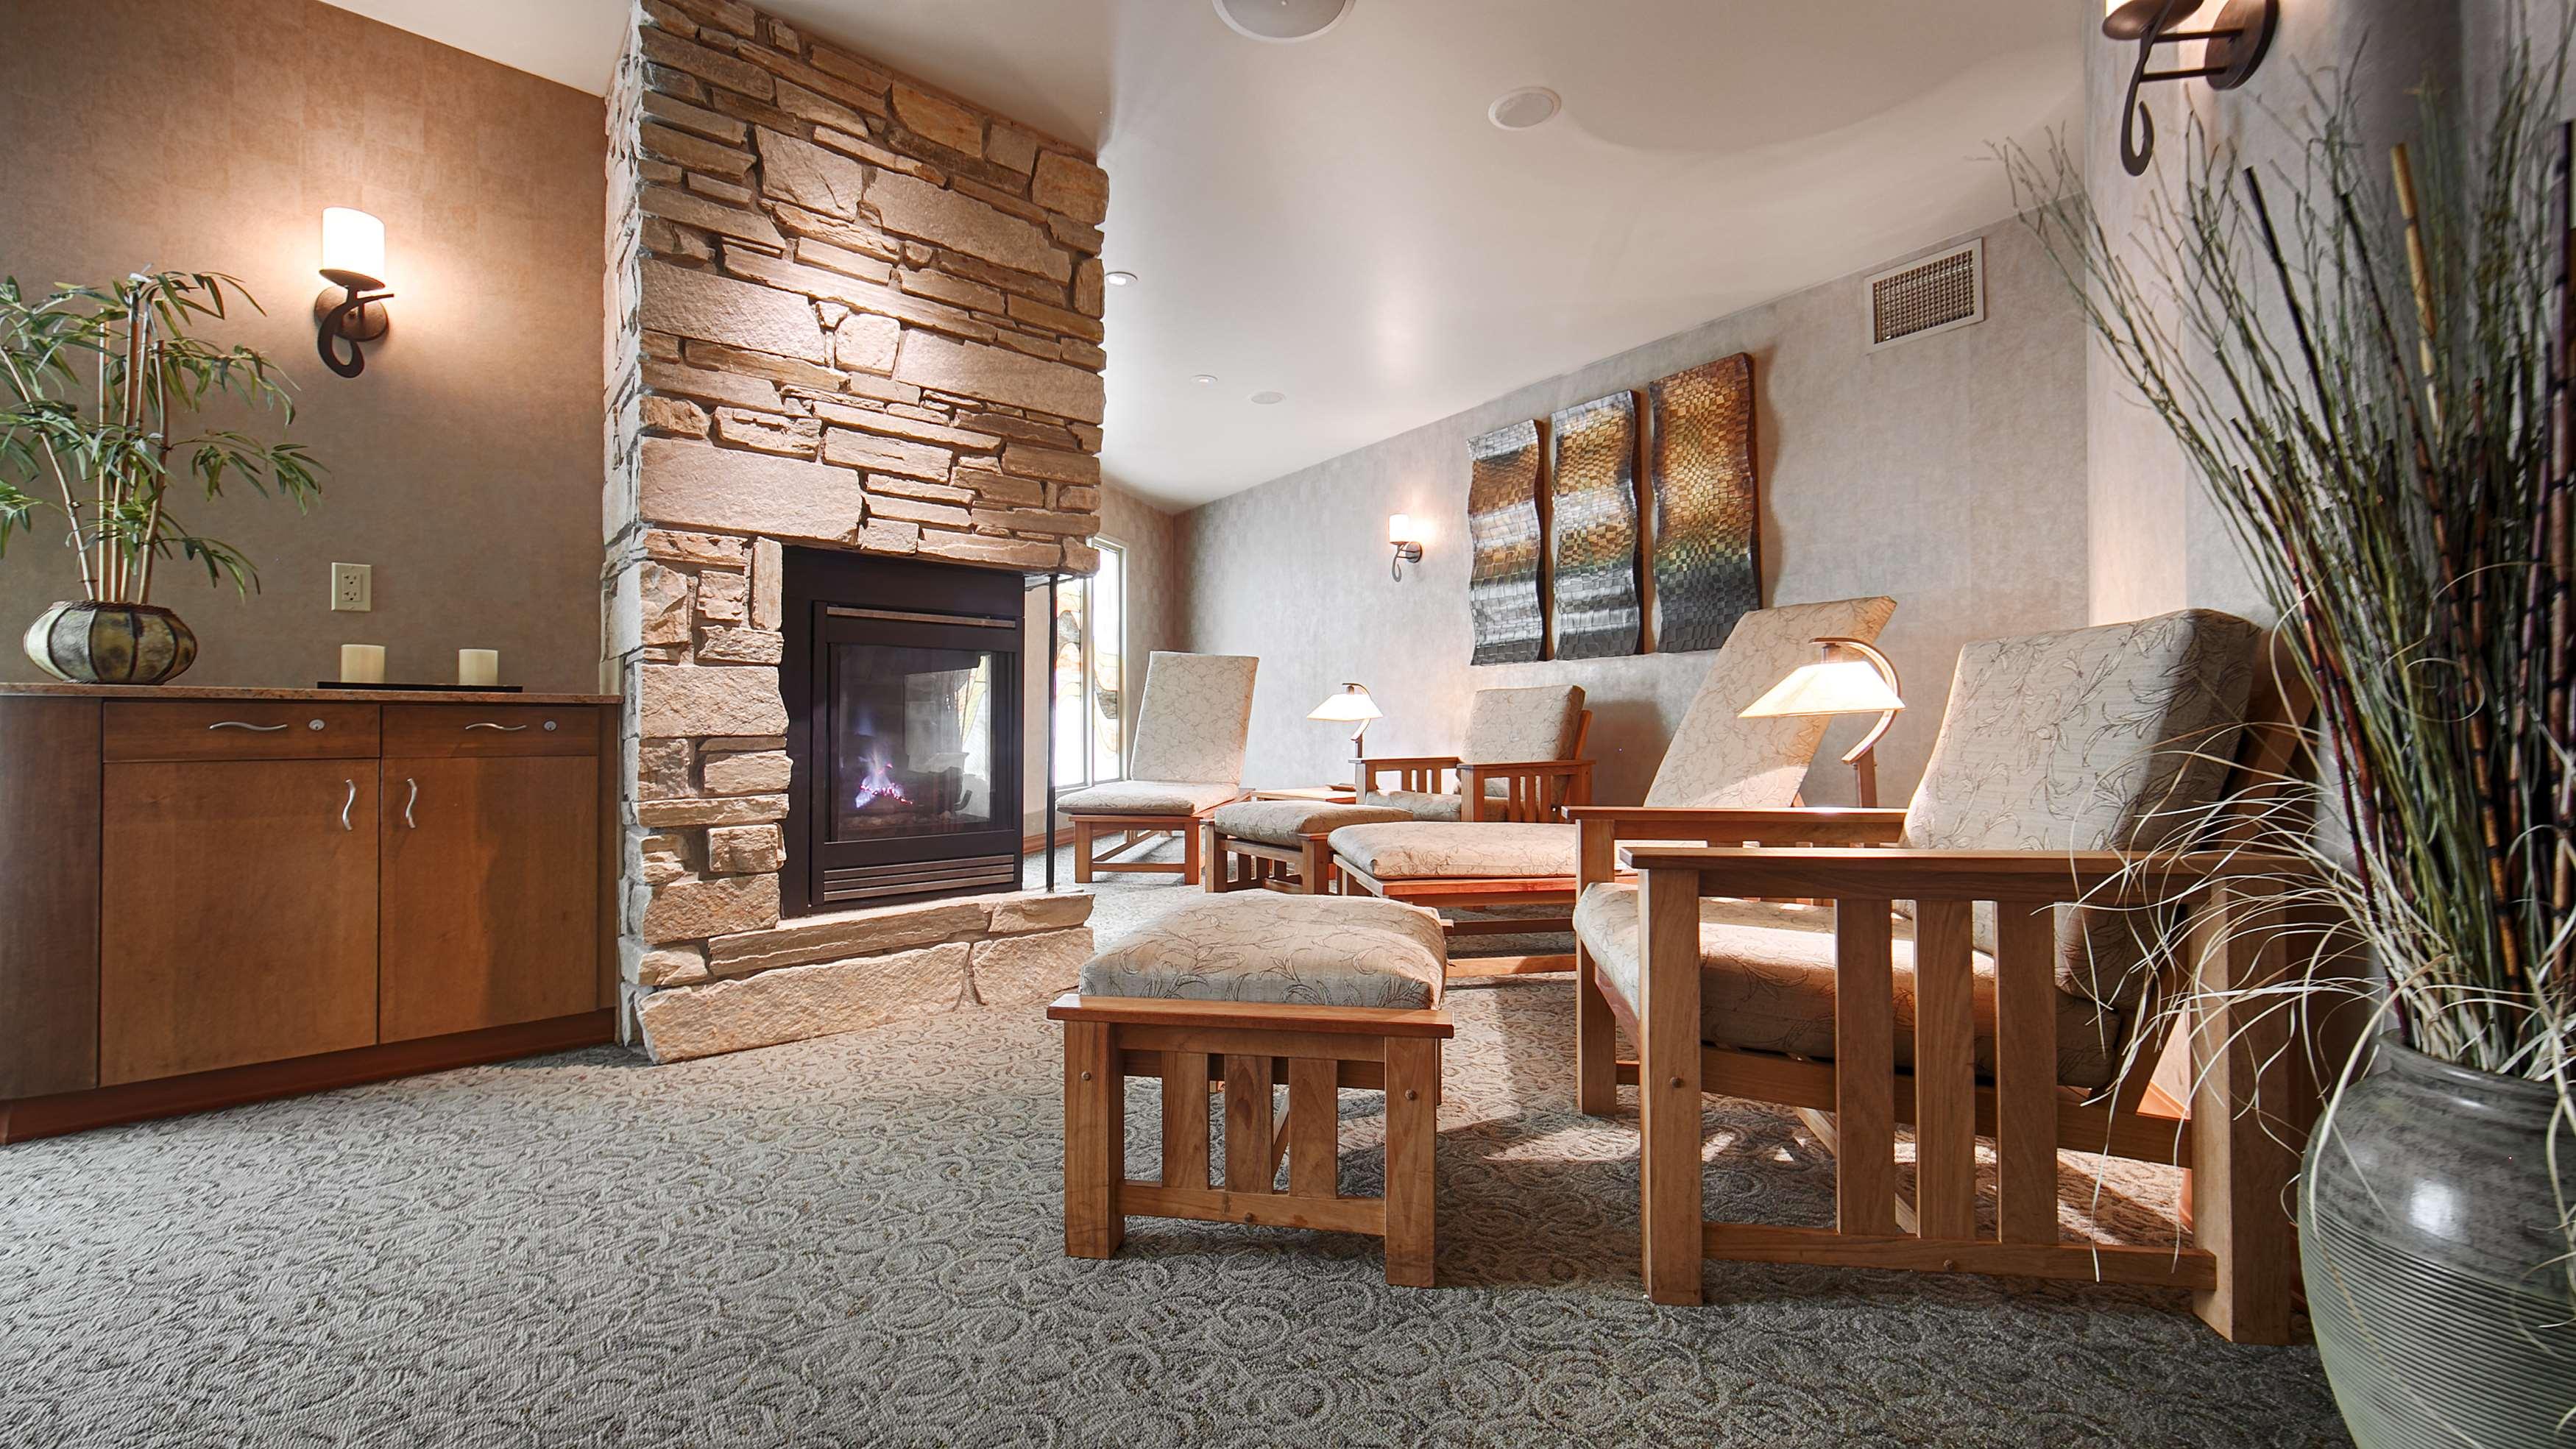 Best Western Plus Kootenai River Inn Casino & Spa image 4